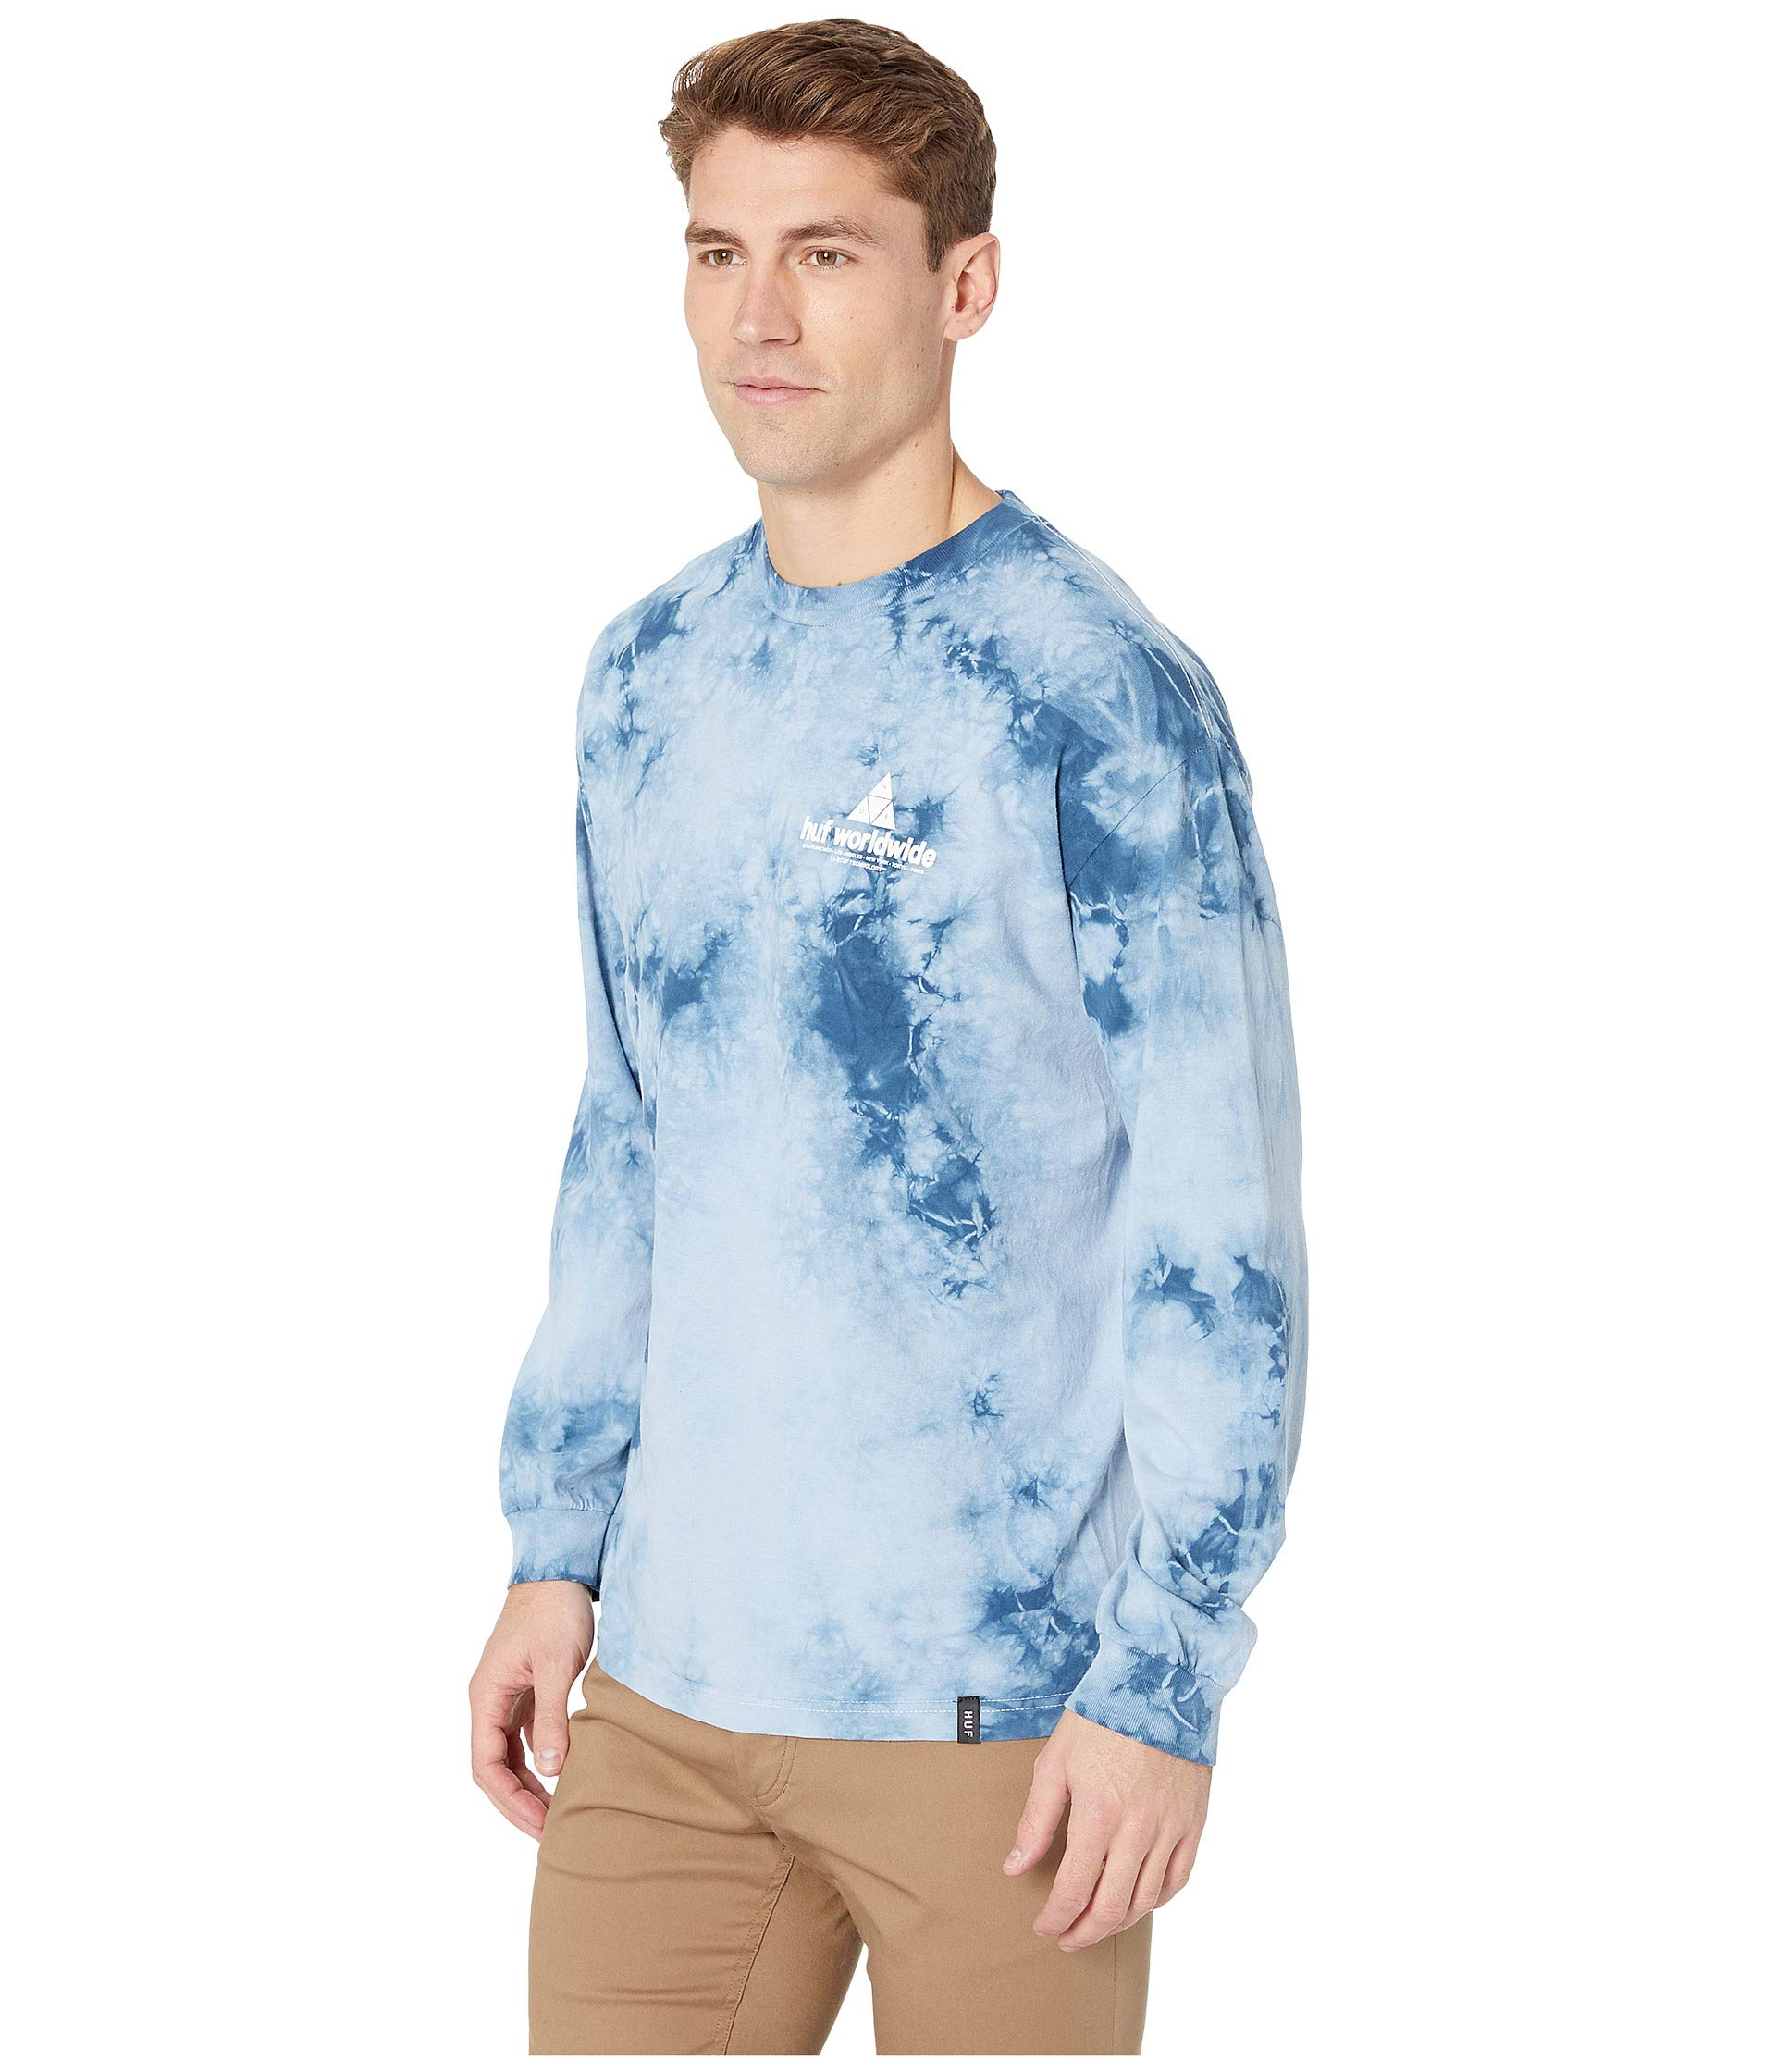 Peak Tee Wash Logo Forever Blue Sleeve Crystal Long Huf fv1dqpxwf